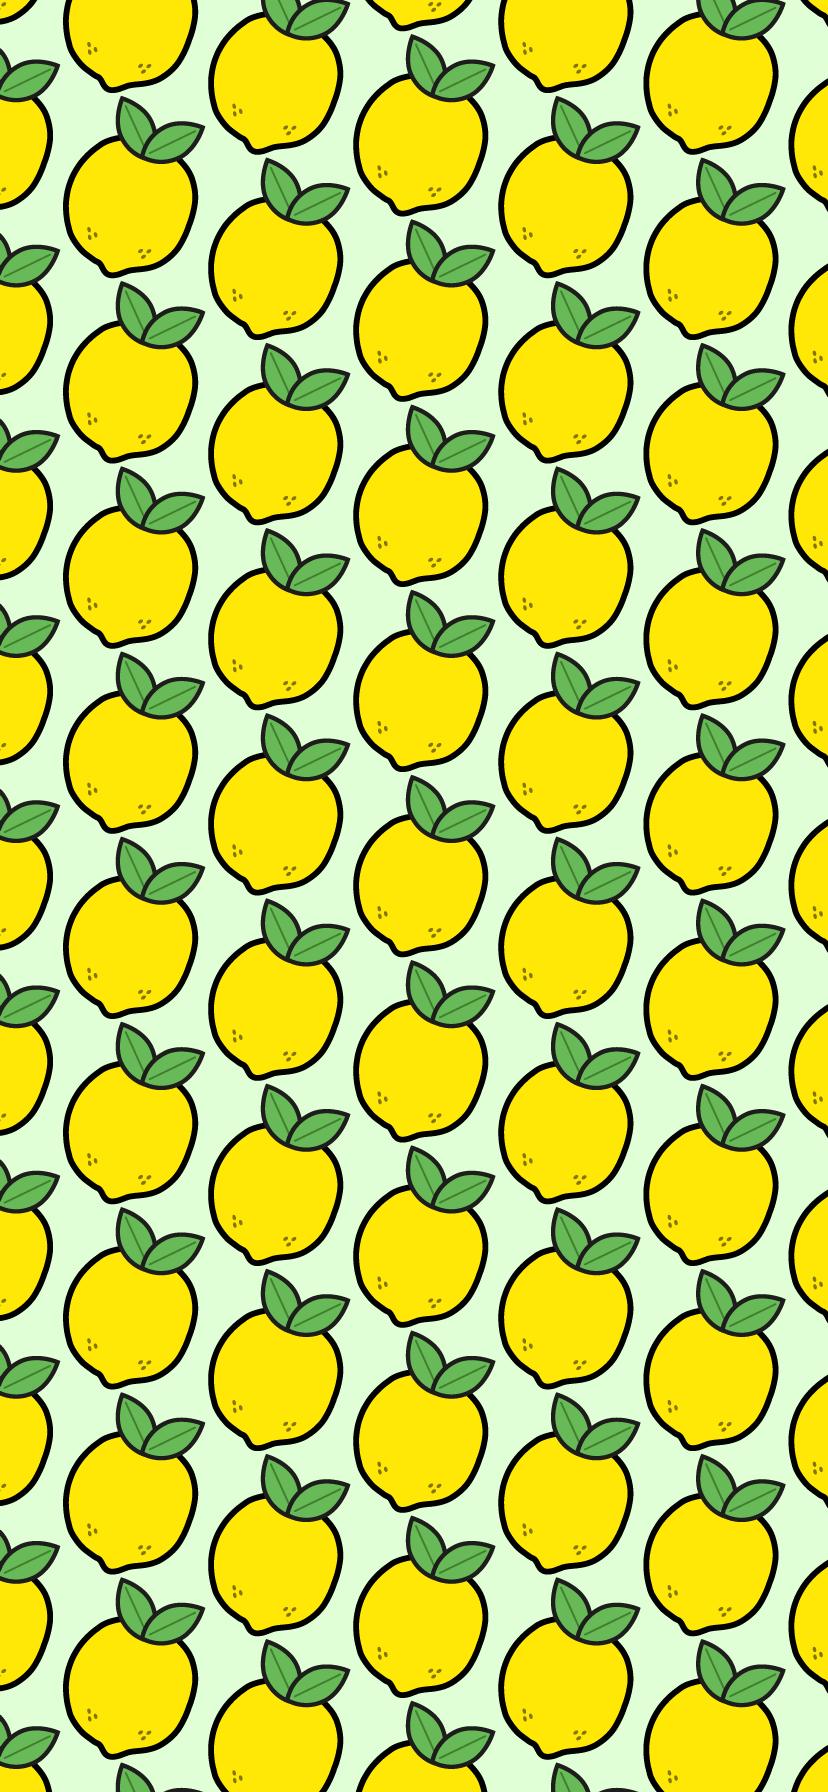 Green Lemon Background Wallpaper For Iphone Xr Lemon Background Iphone Wallpaper Yellow Iphone Wallpaper Pattern